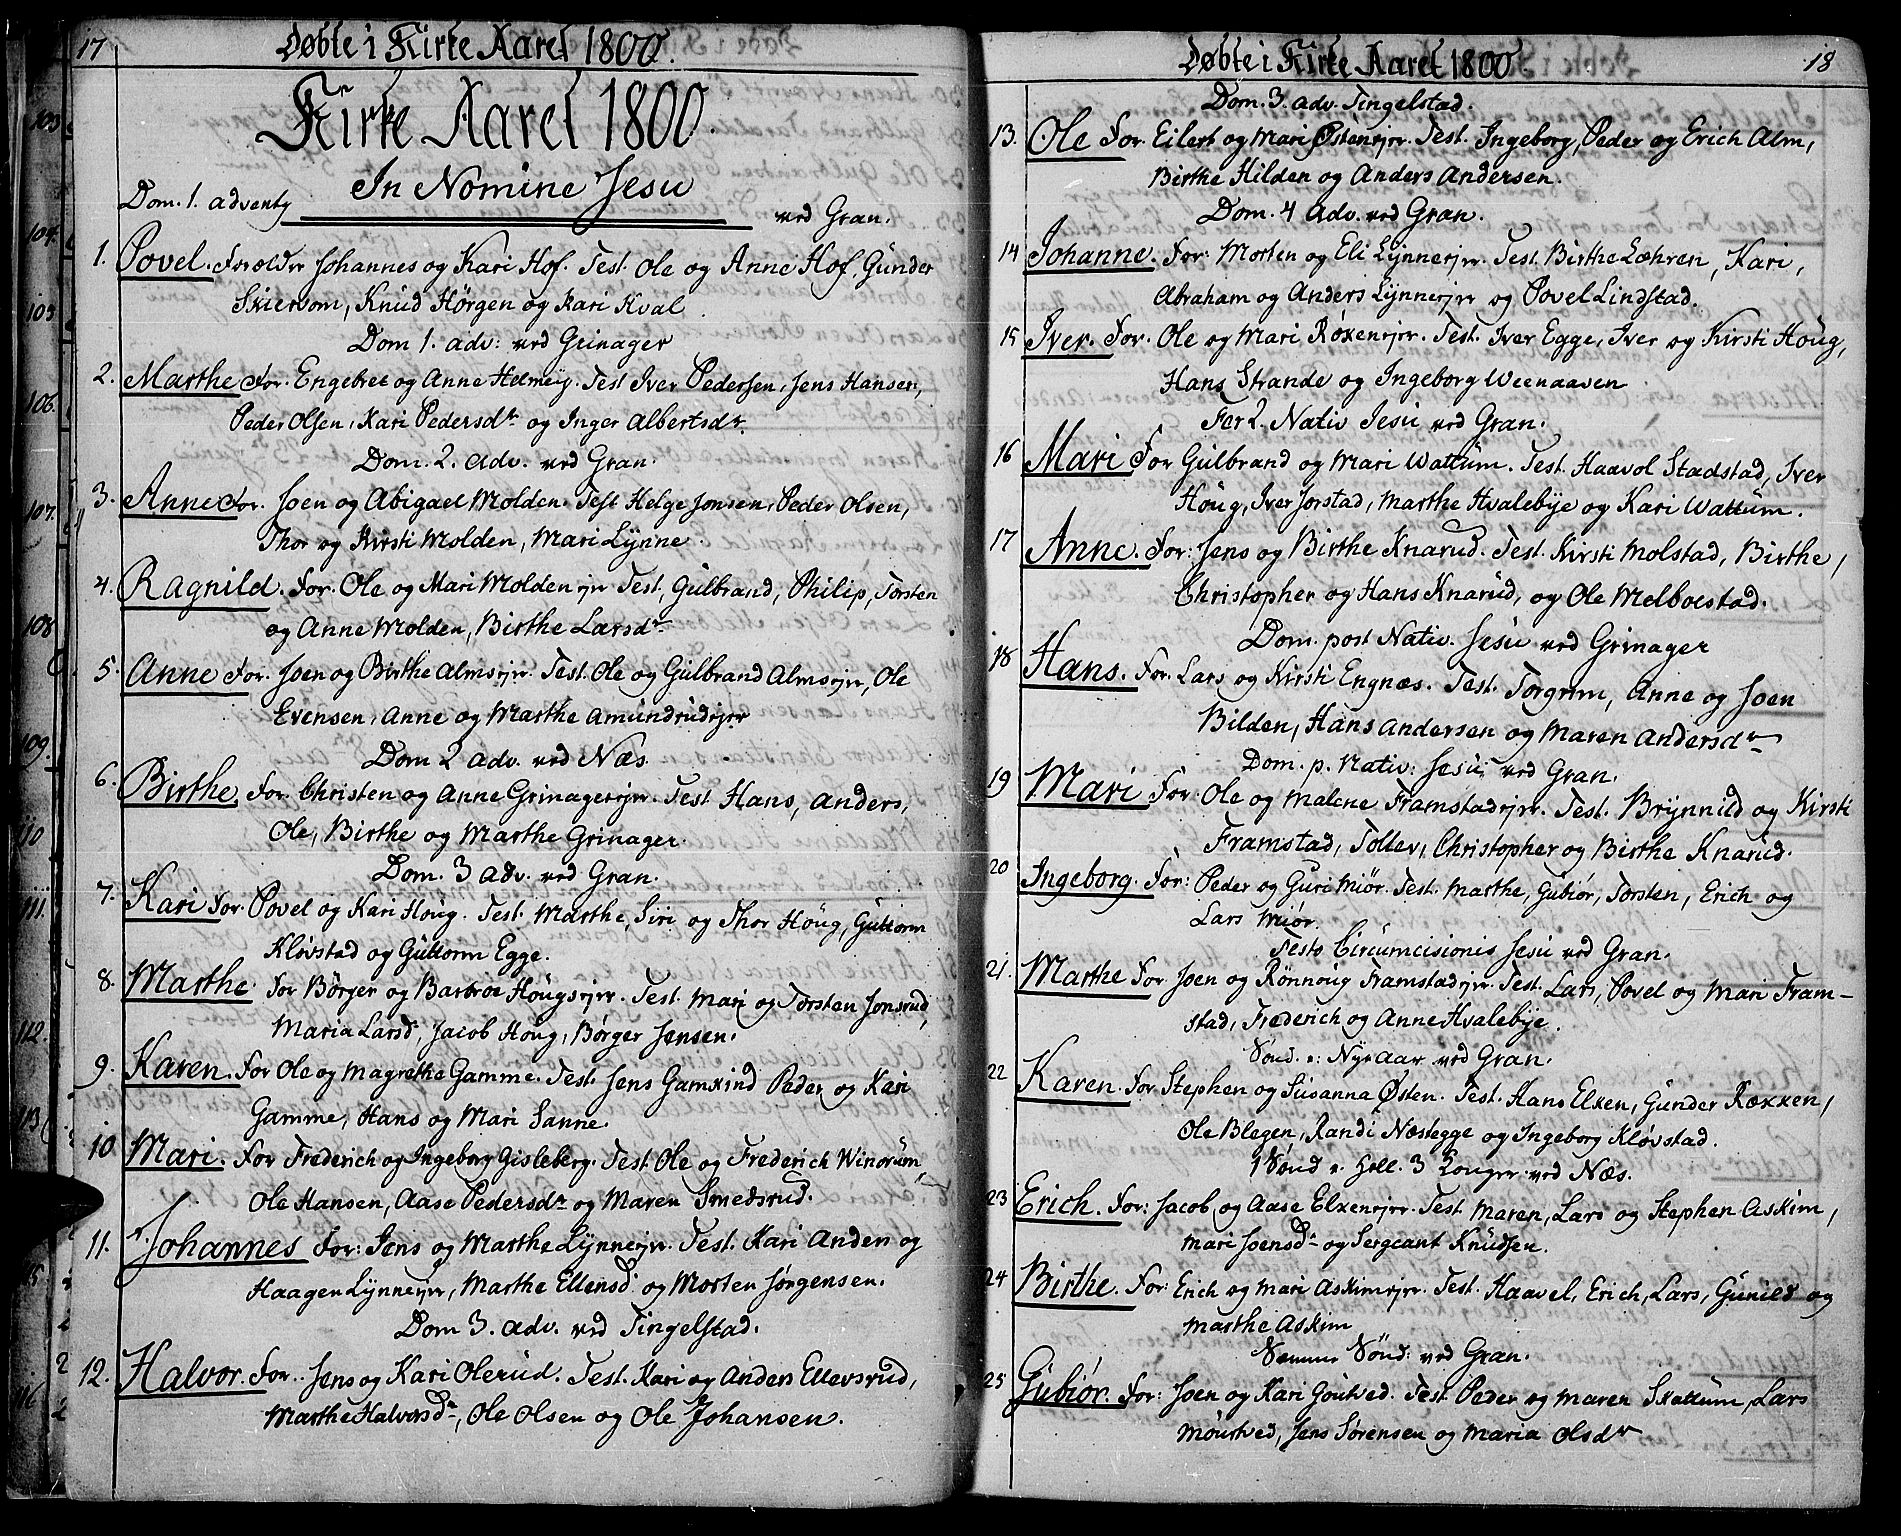 SAH, Gran prestekontor, Ministerialbok nr. 8, 1798-1811, s. 17-18